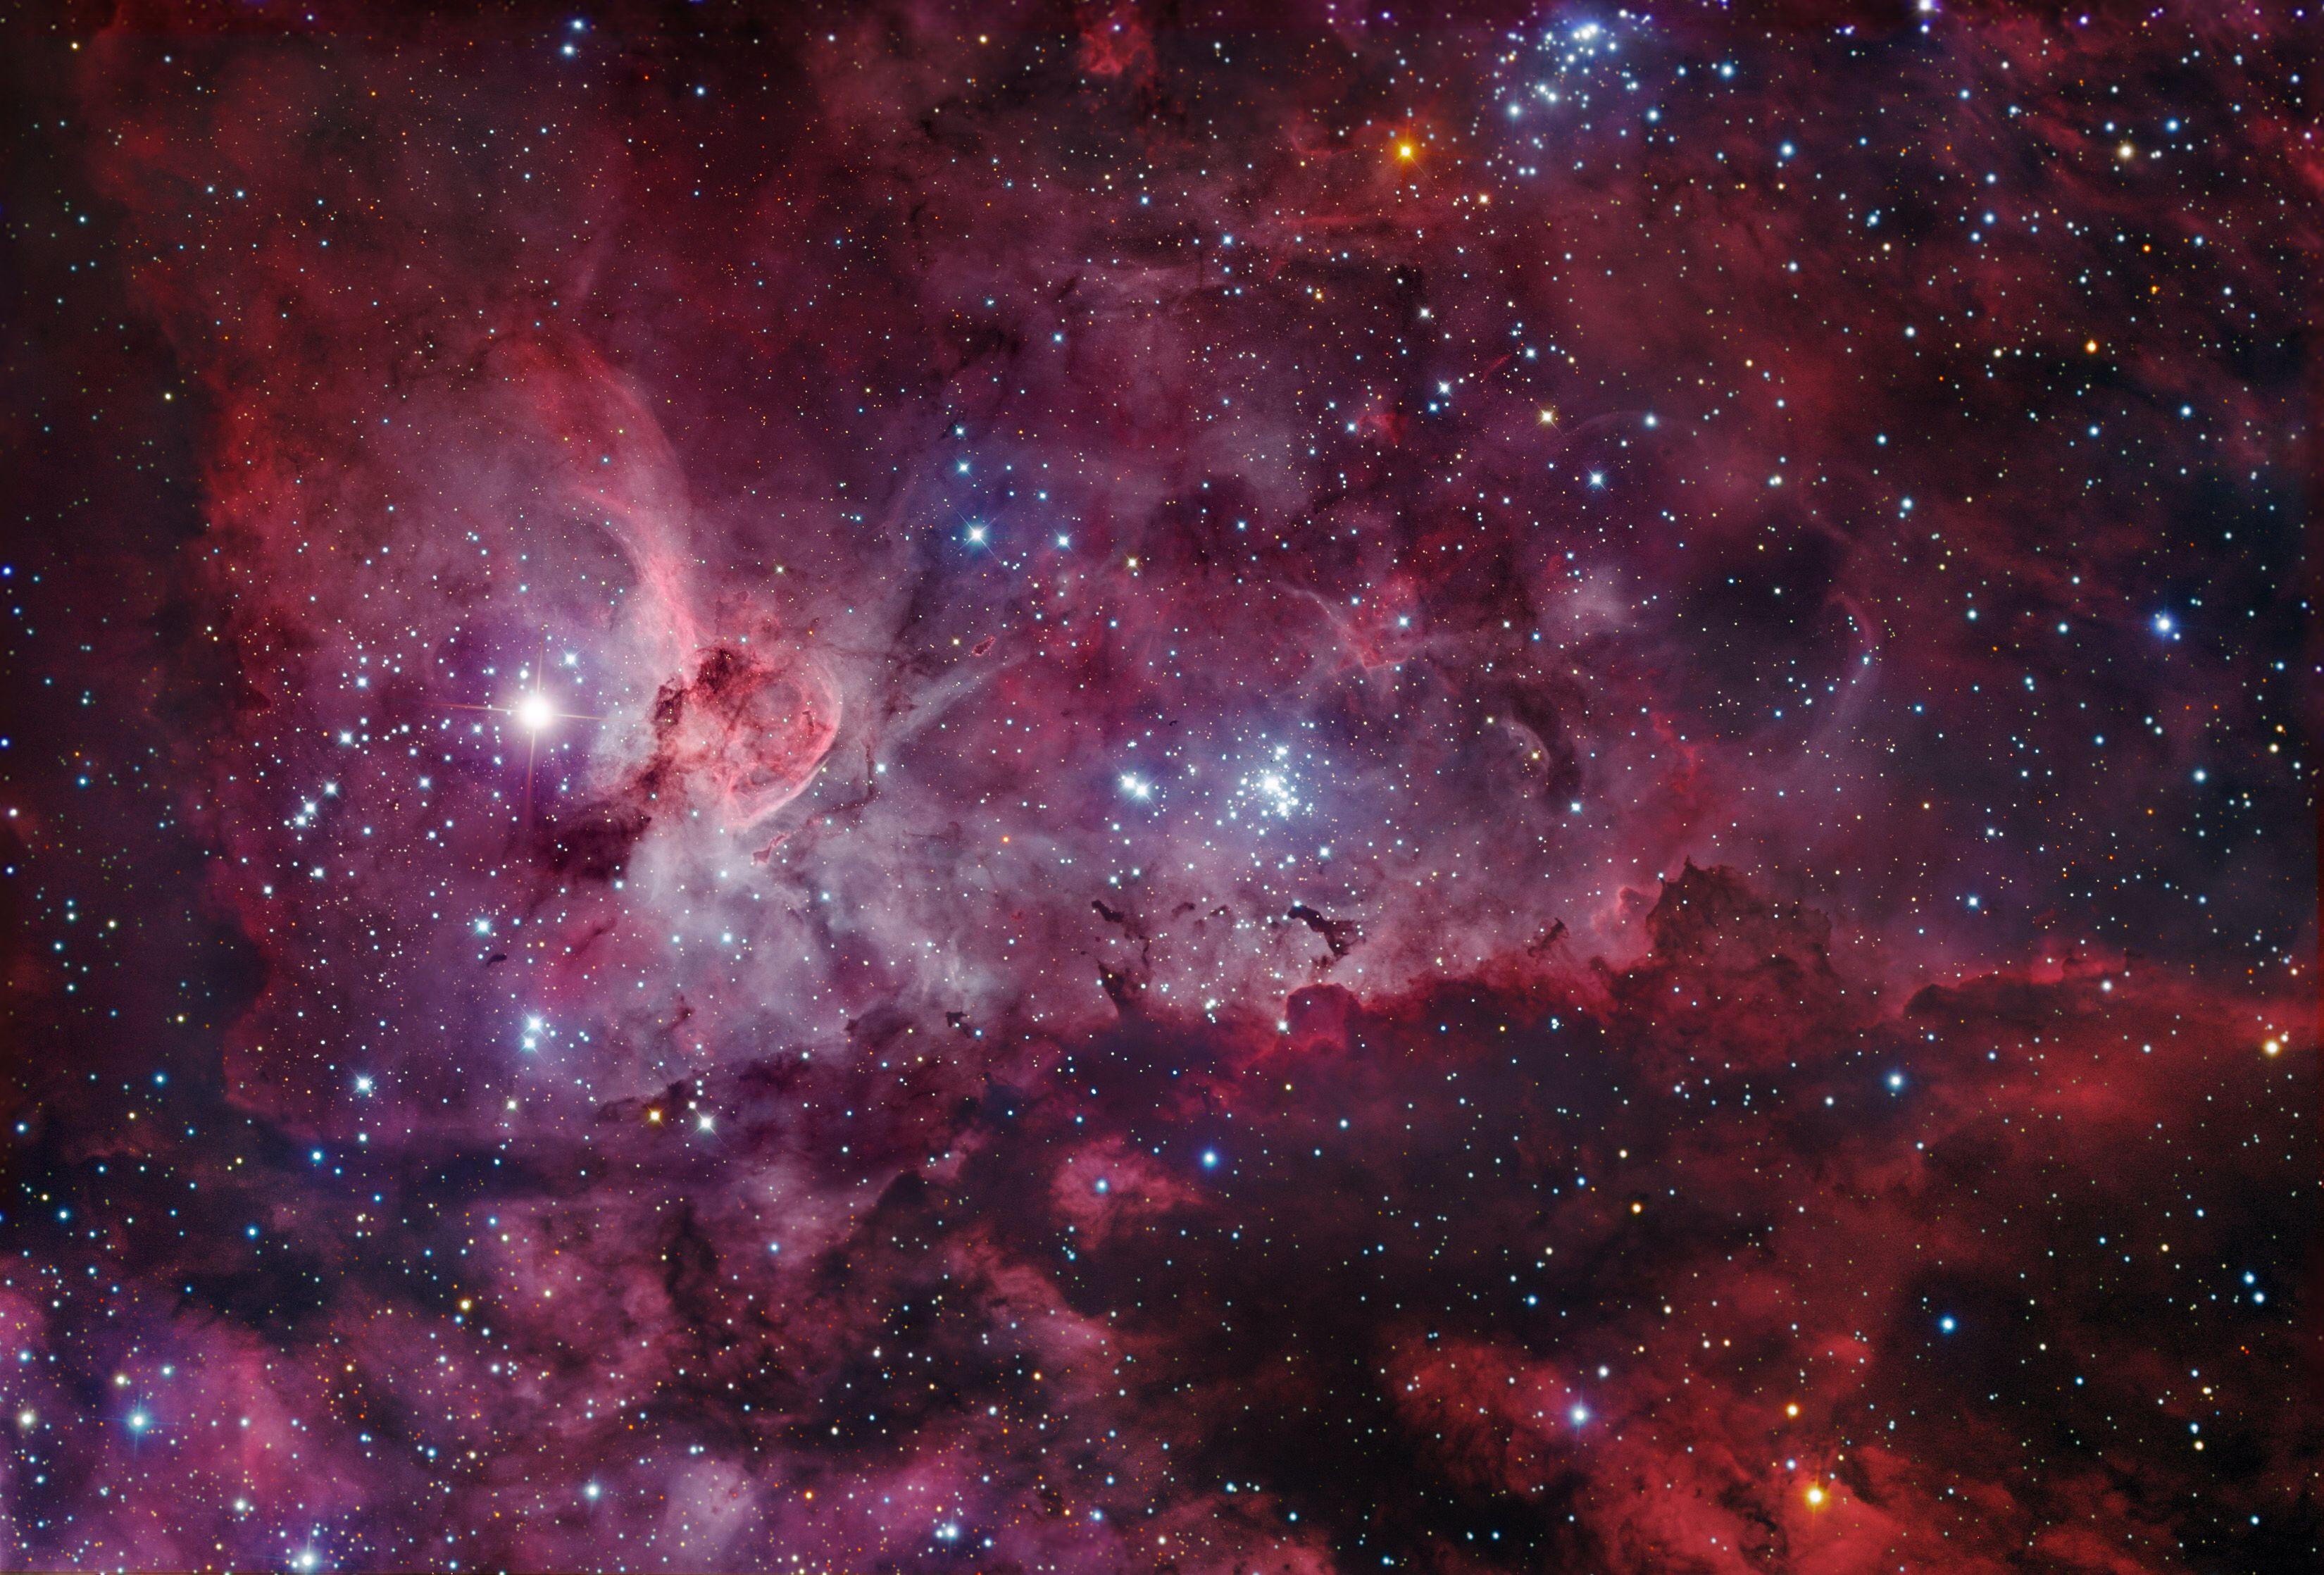 Image from http://apod.nasa.gov/apod/image/1106/NGC3372_gendlerhannahoe.jpg.